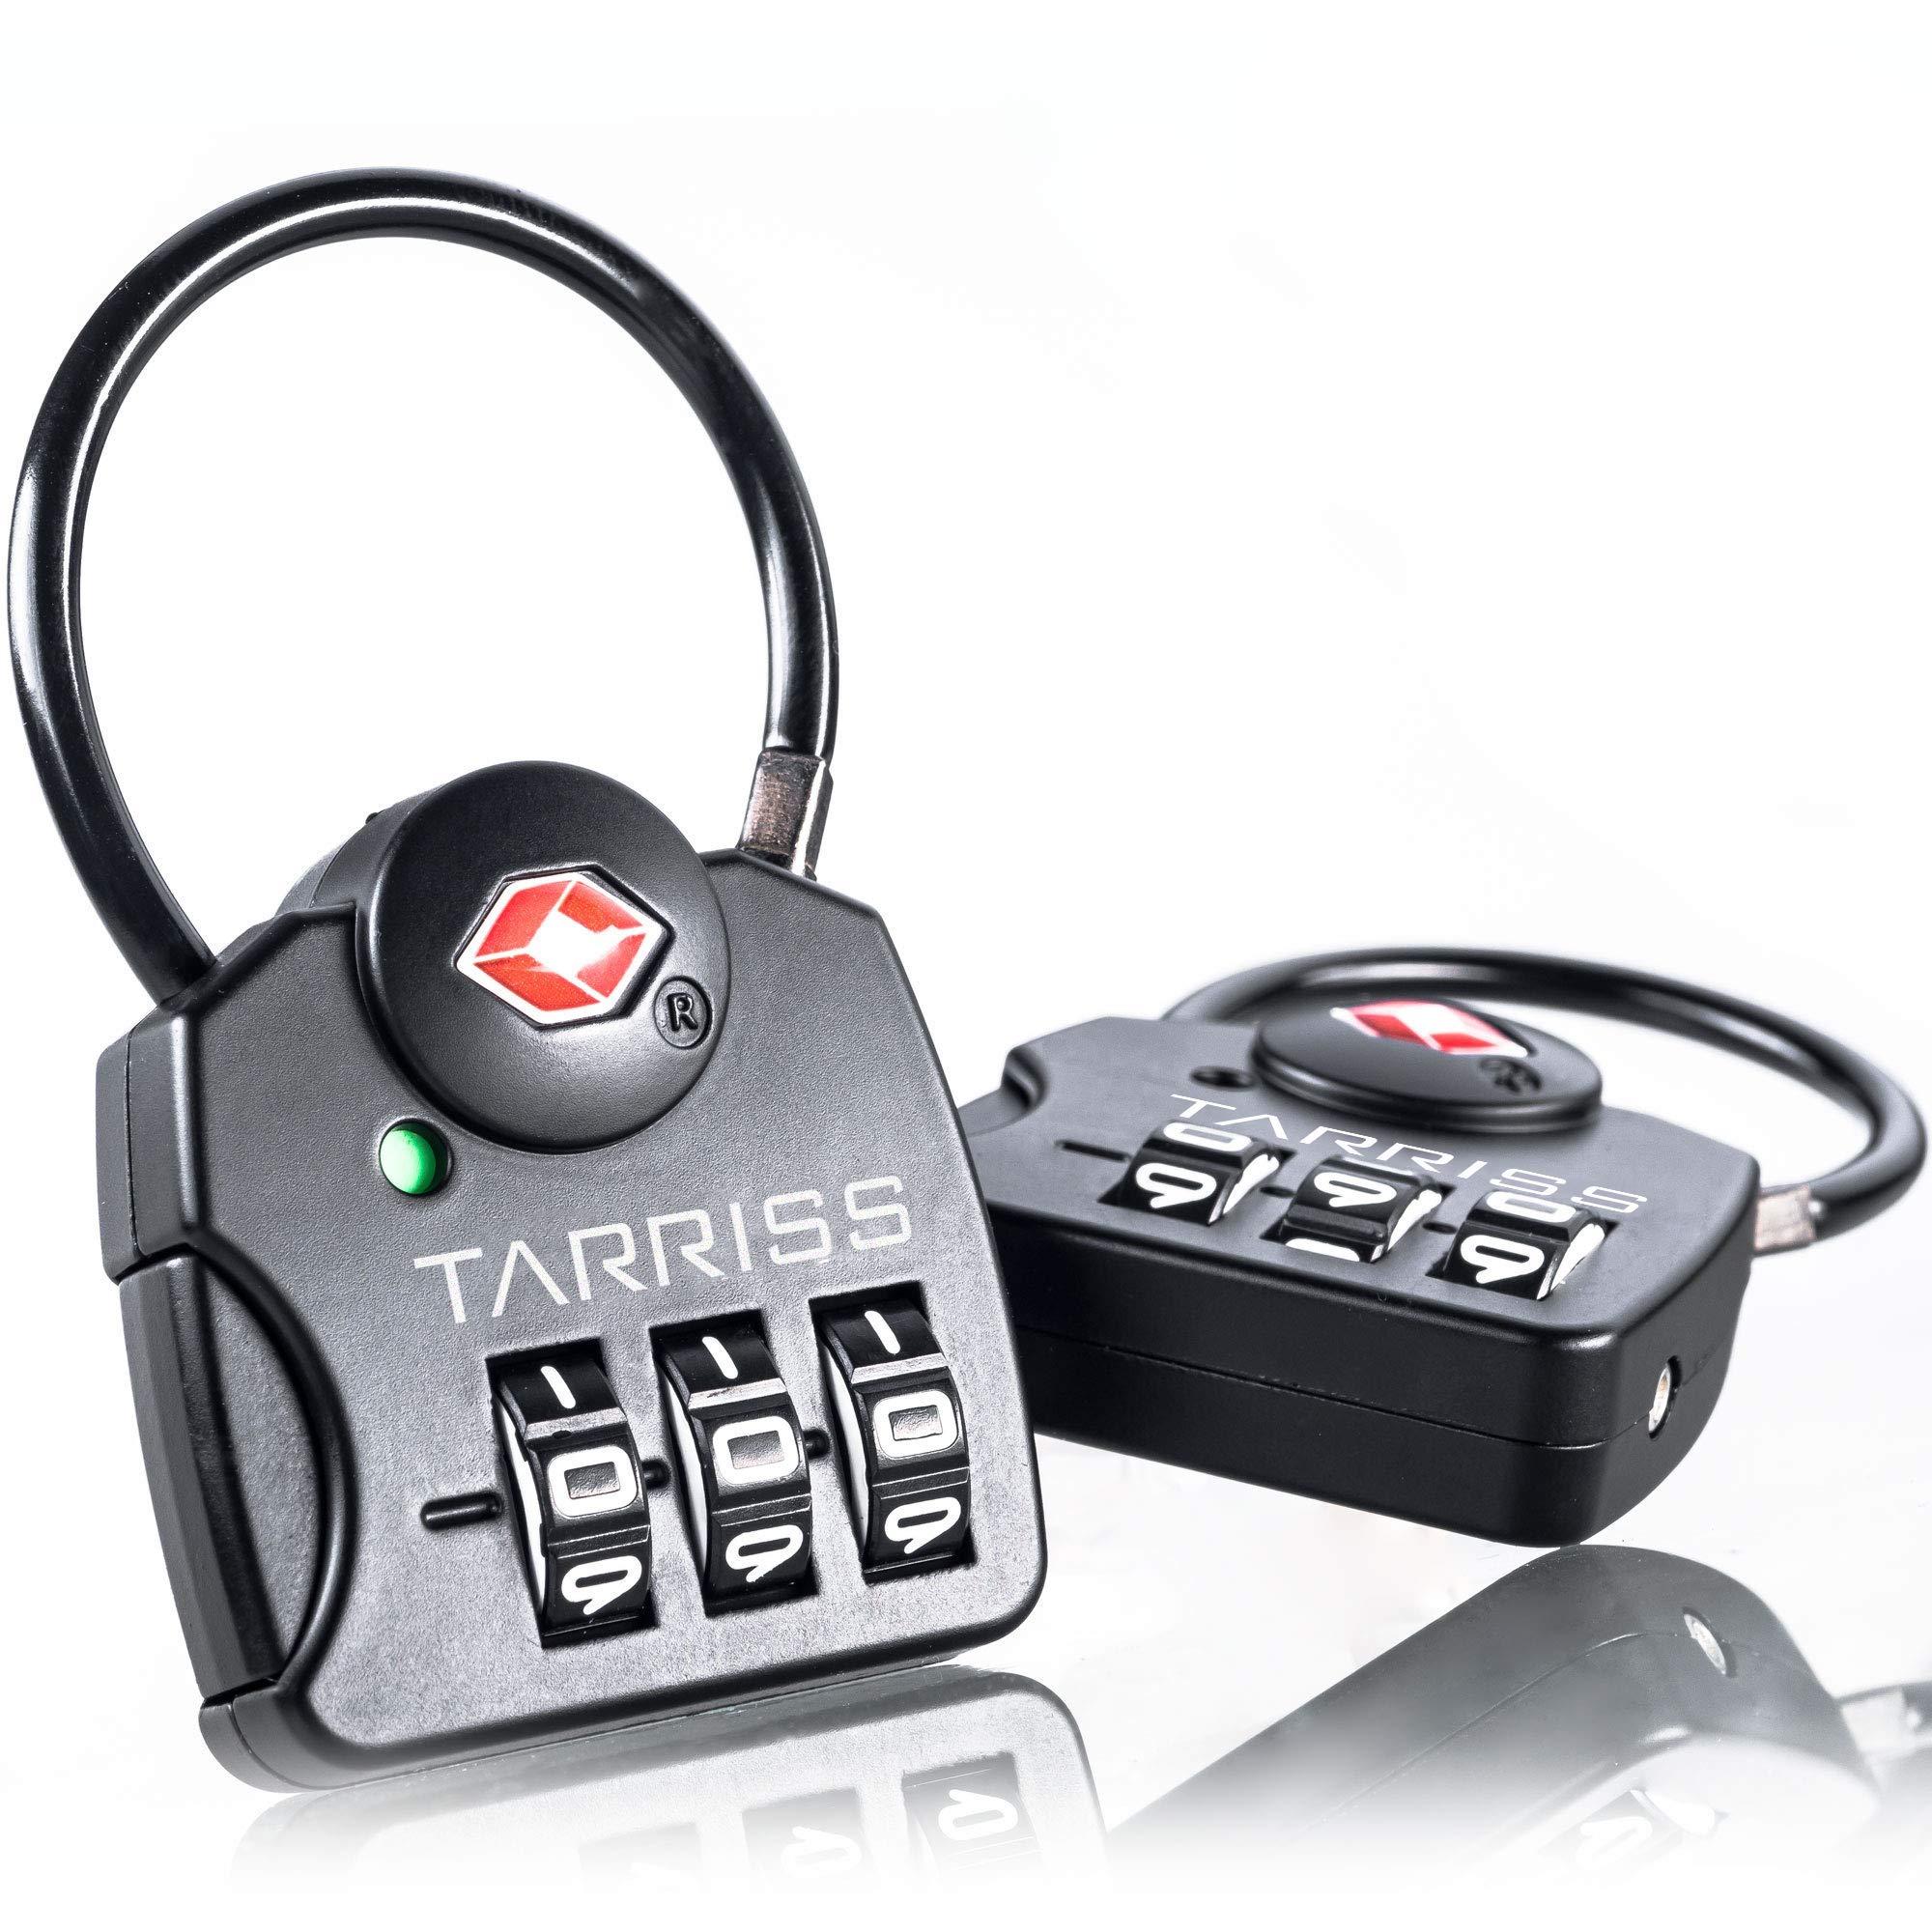 Tarriss TSA Luggage Lock with SearchAlert (2 Pack) (Midnight Black) by Tarriss